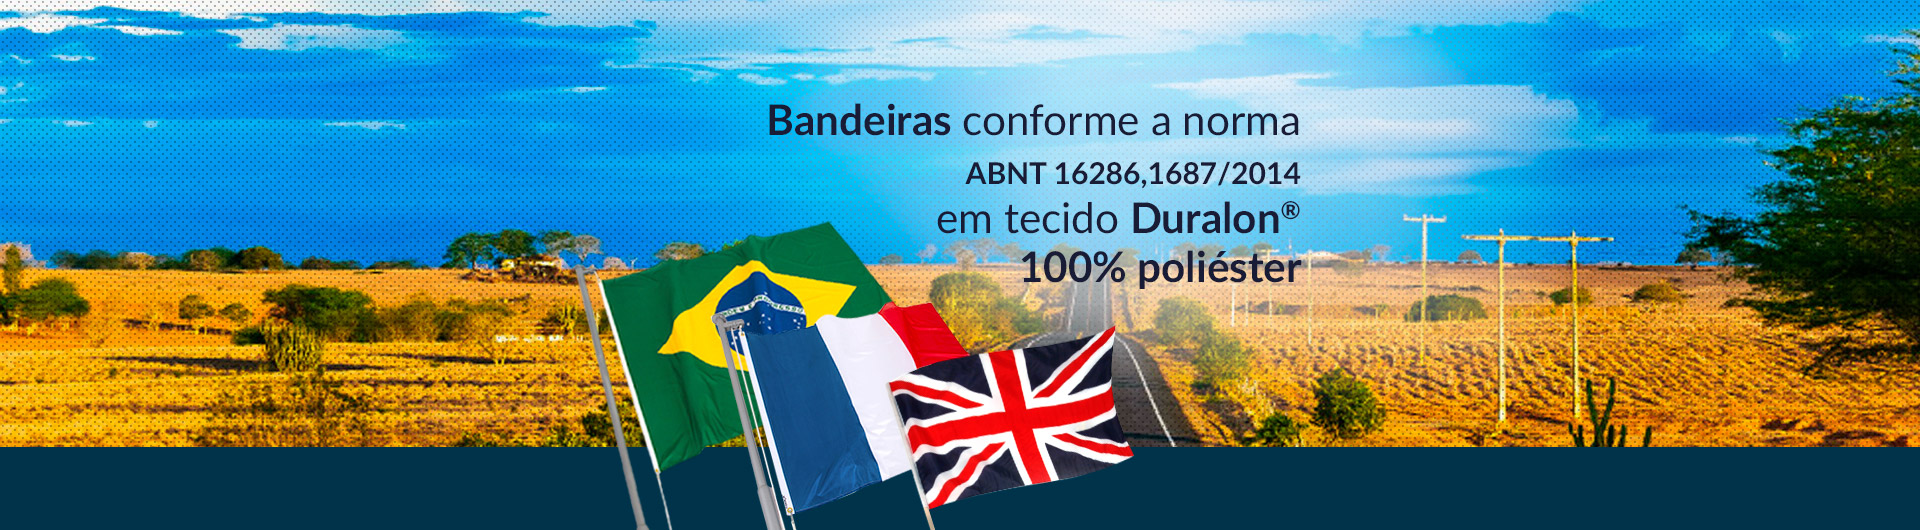 Bandeiras personalizadas conforme a norma ABNT 16286,1687/2014 em Duralon 100% poliéster